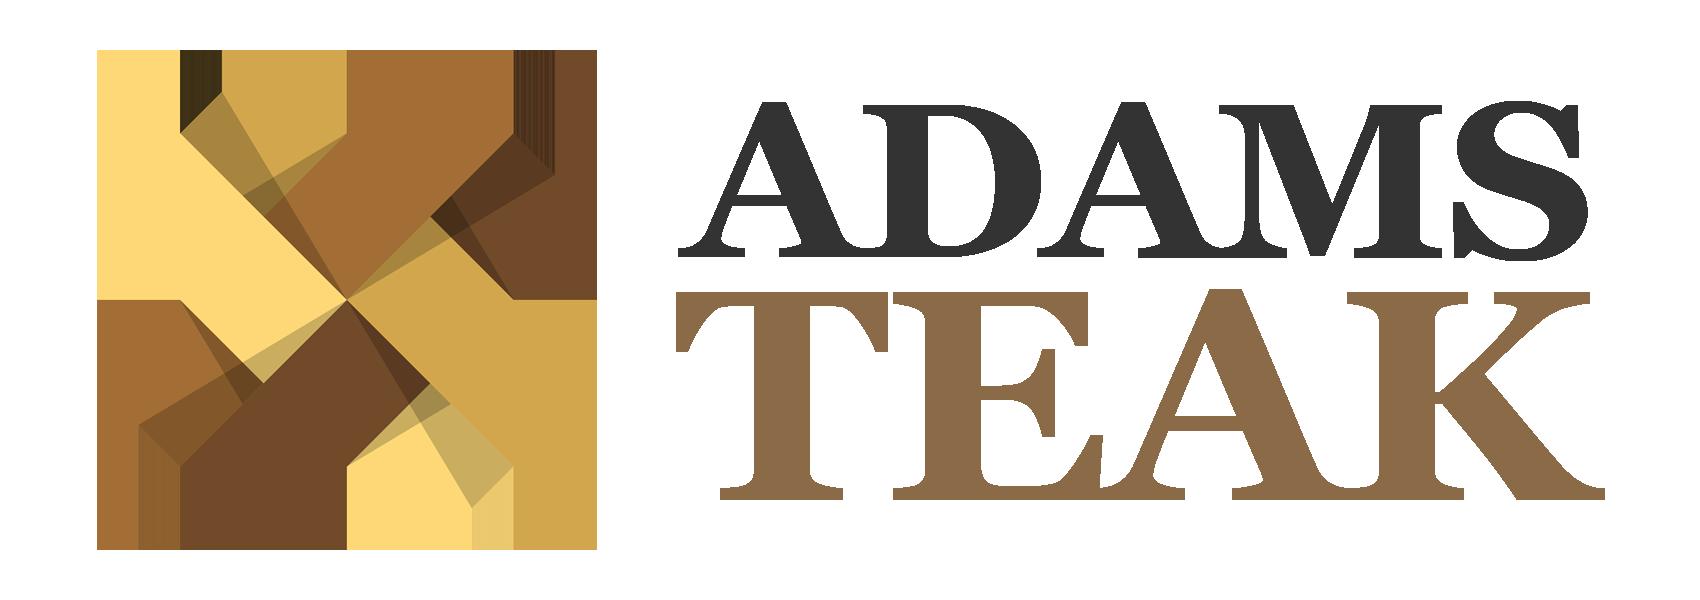 Adams Teak